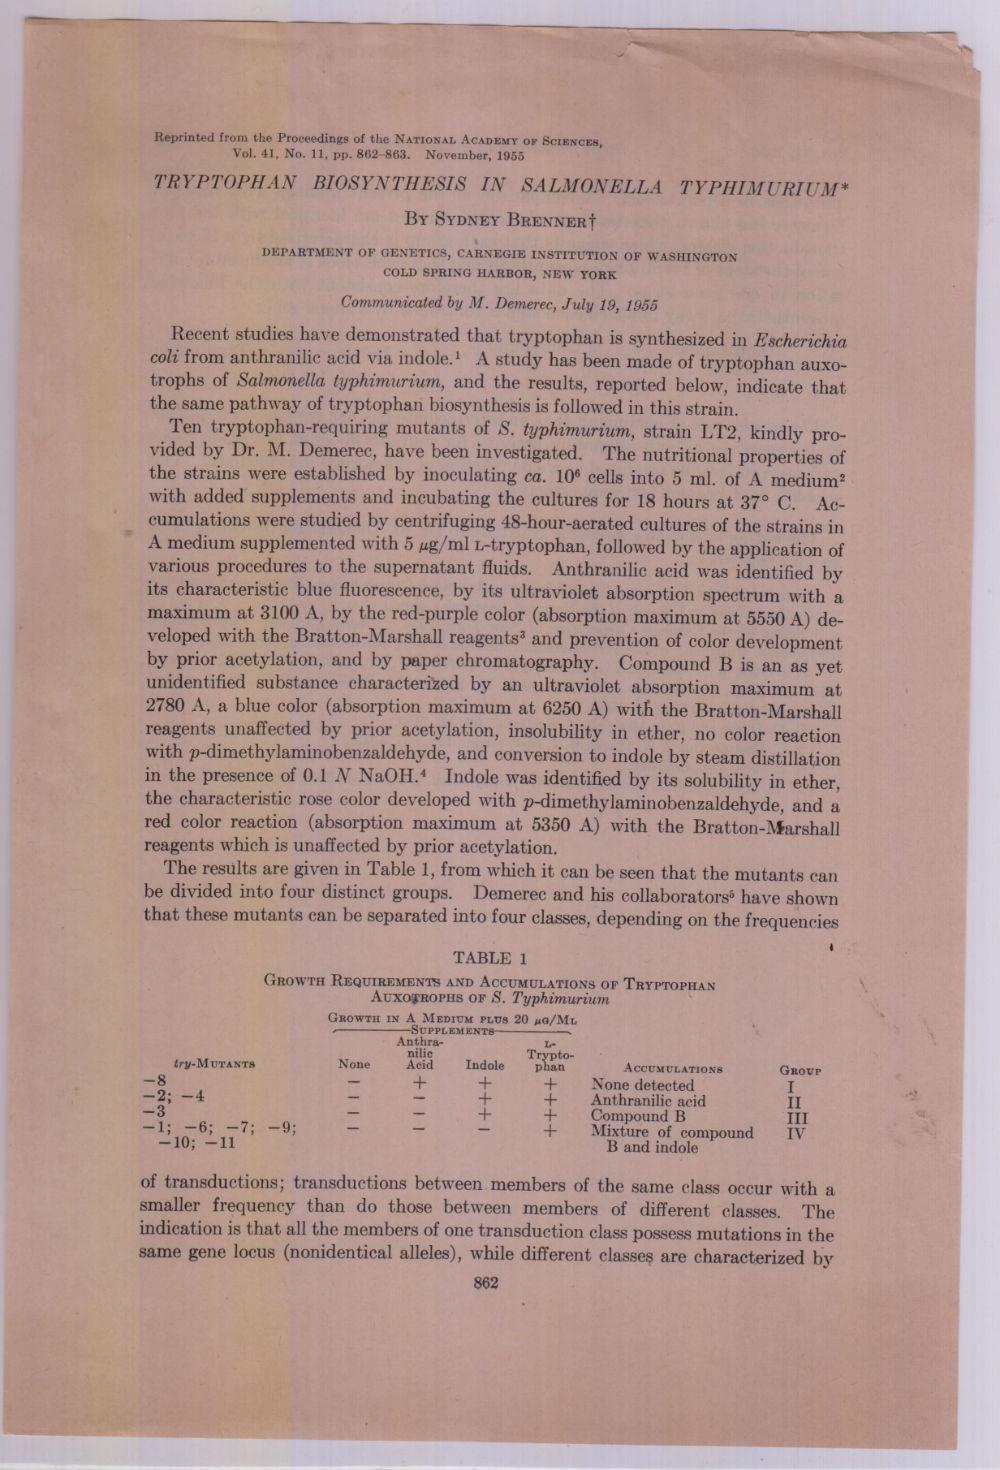 TRYPTOPHAN BIOSYNTHESIS IN Salmonella Typhimurium, Brenner, Sydney